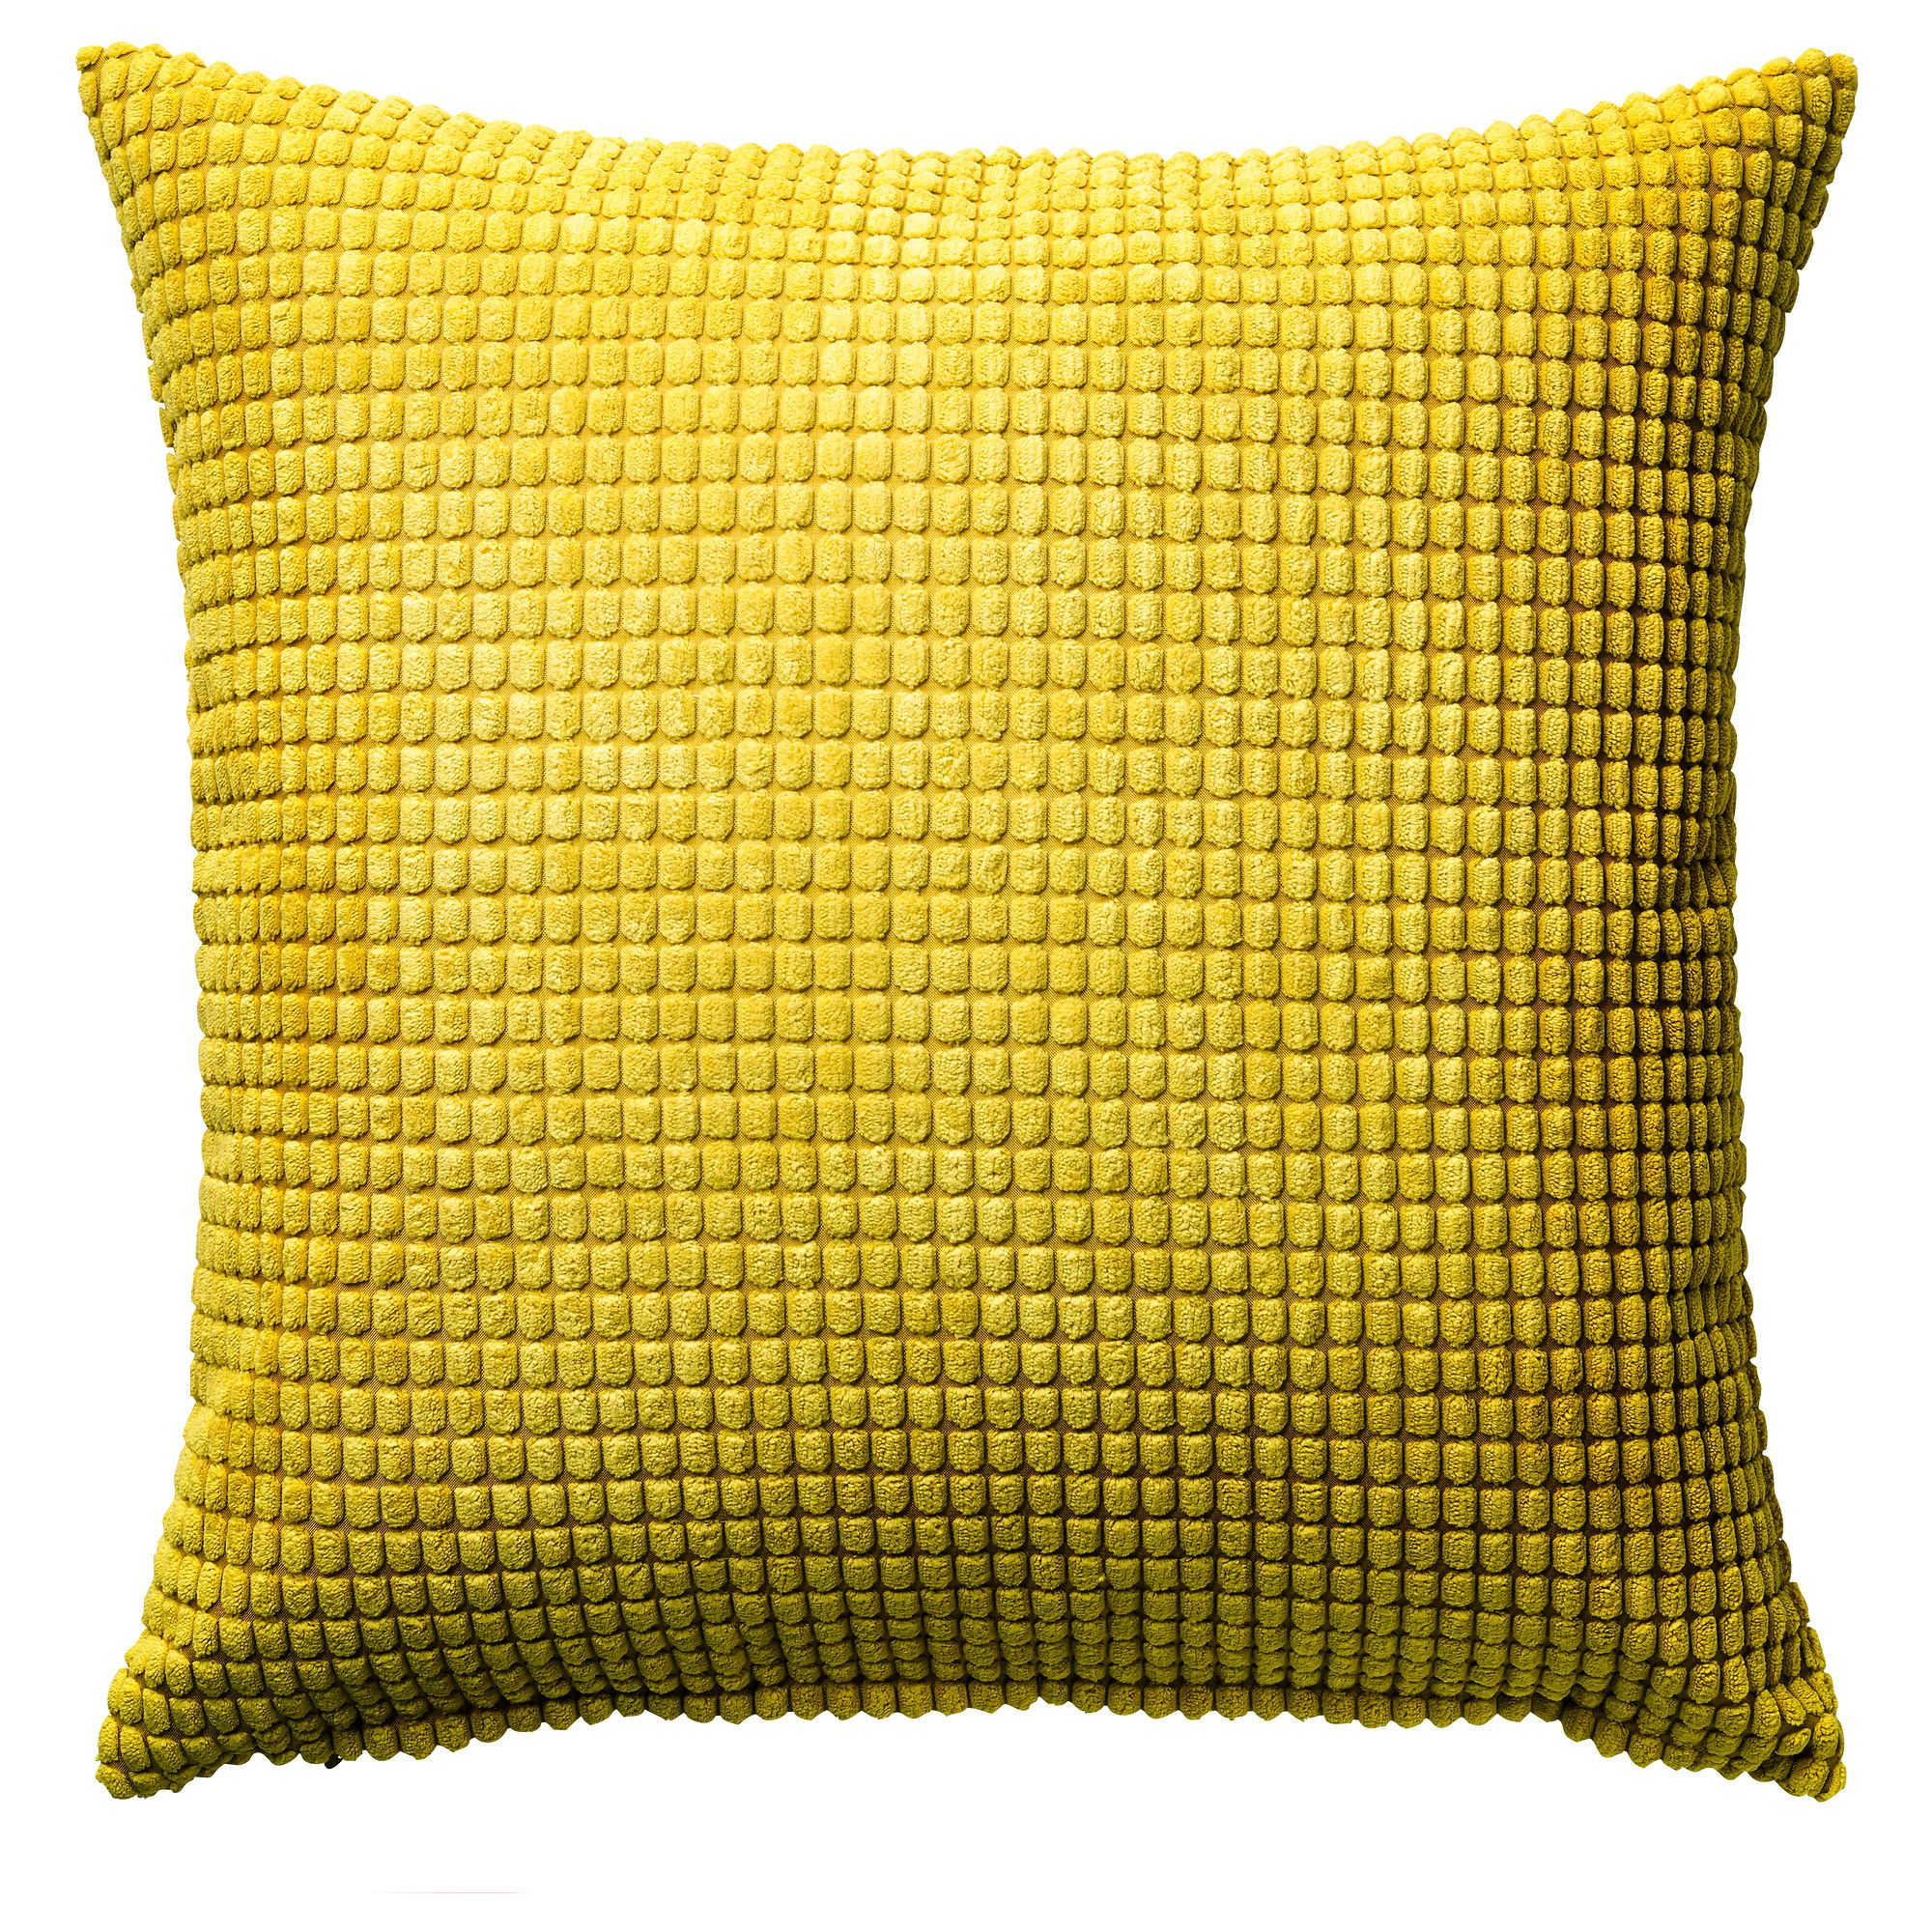 $12 IKEA GULLKLOCKA Cushion cover Chenille fabric feels ultra